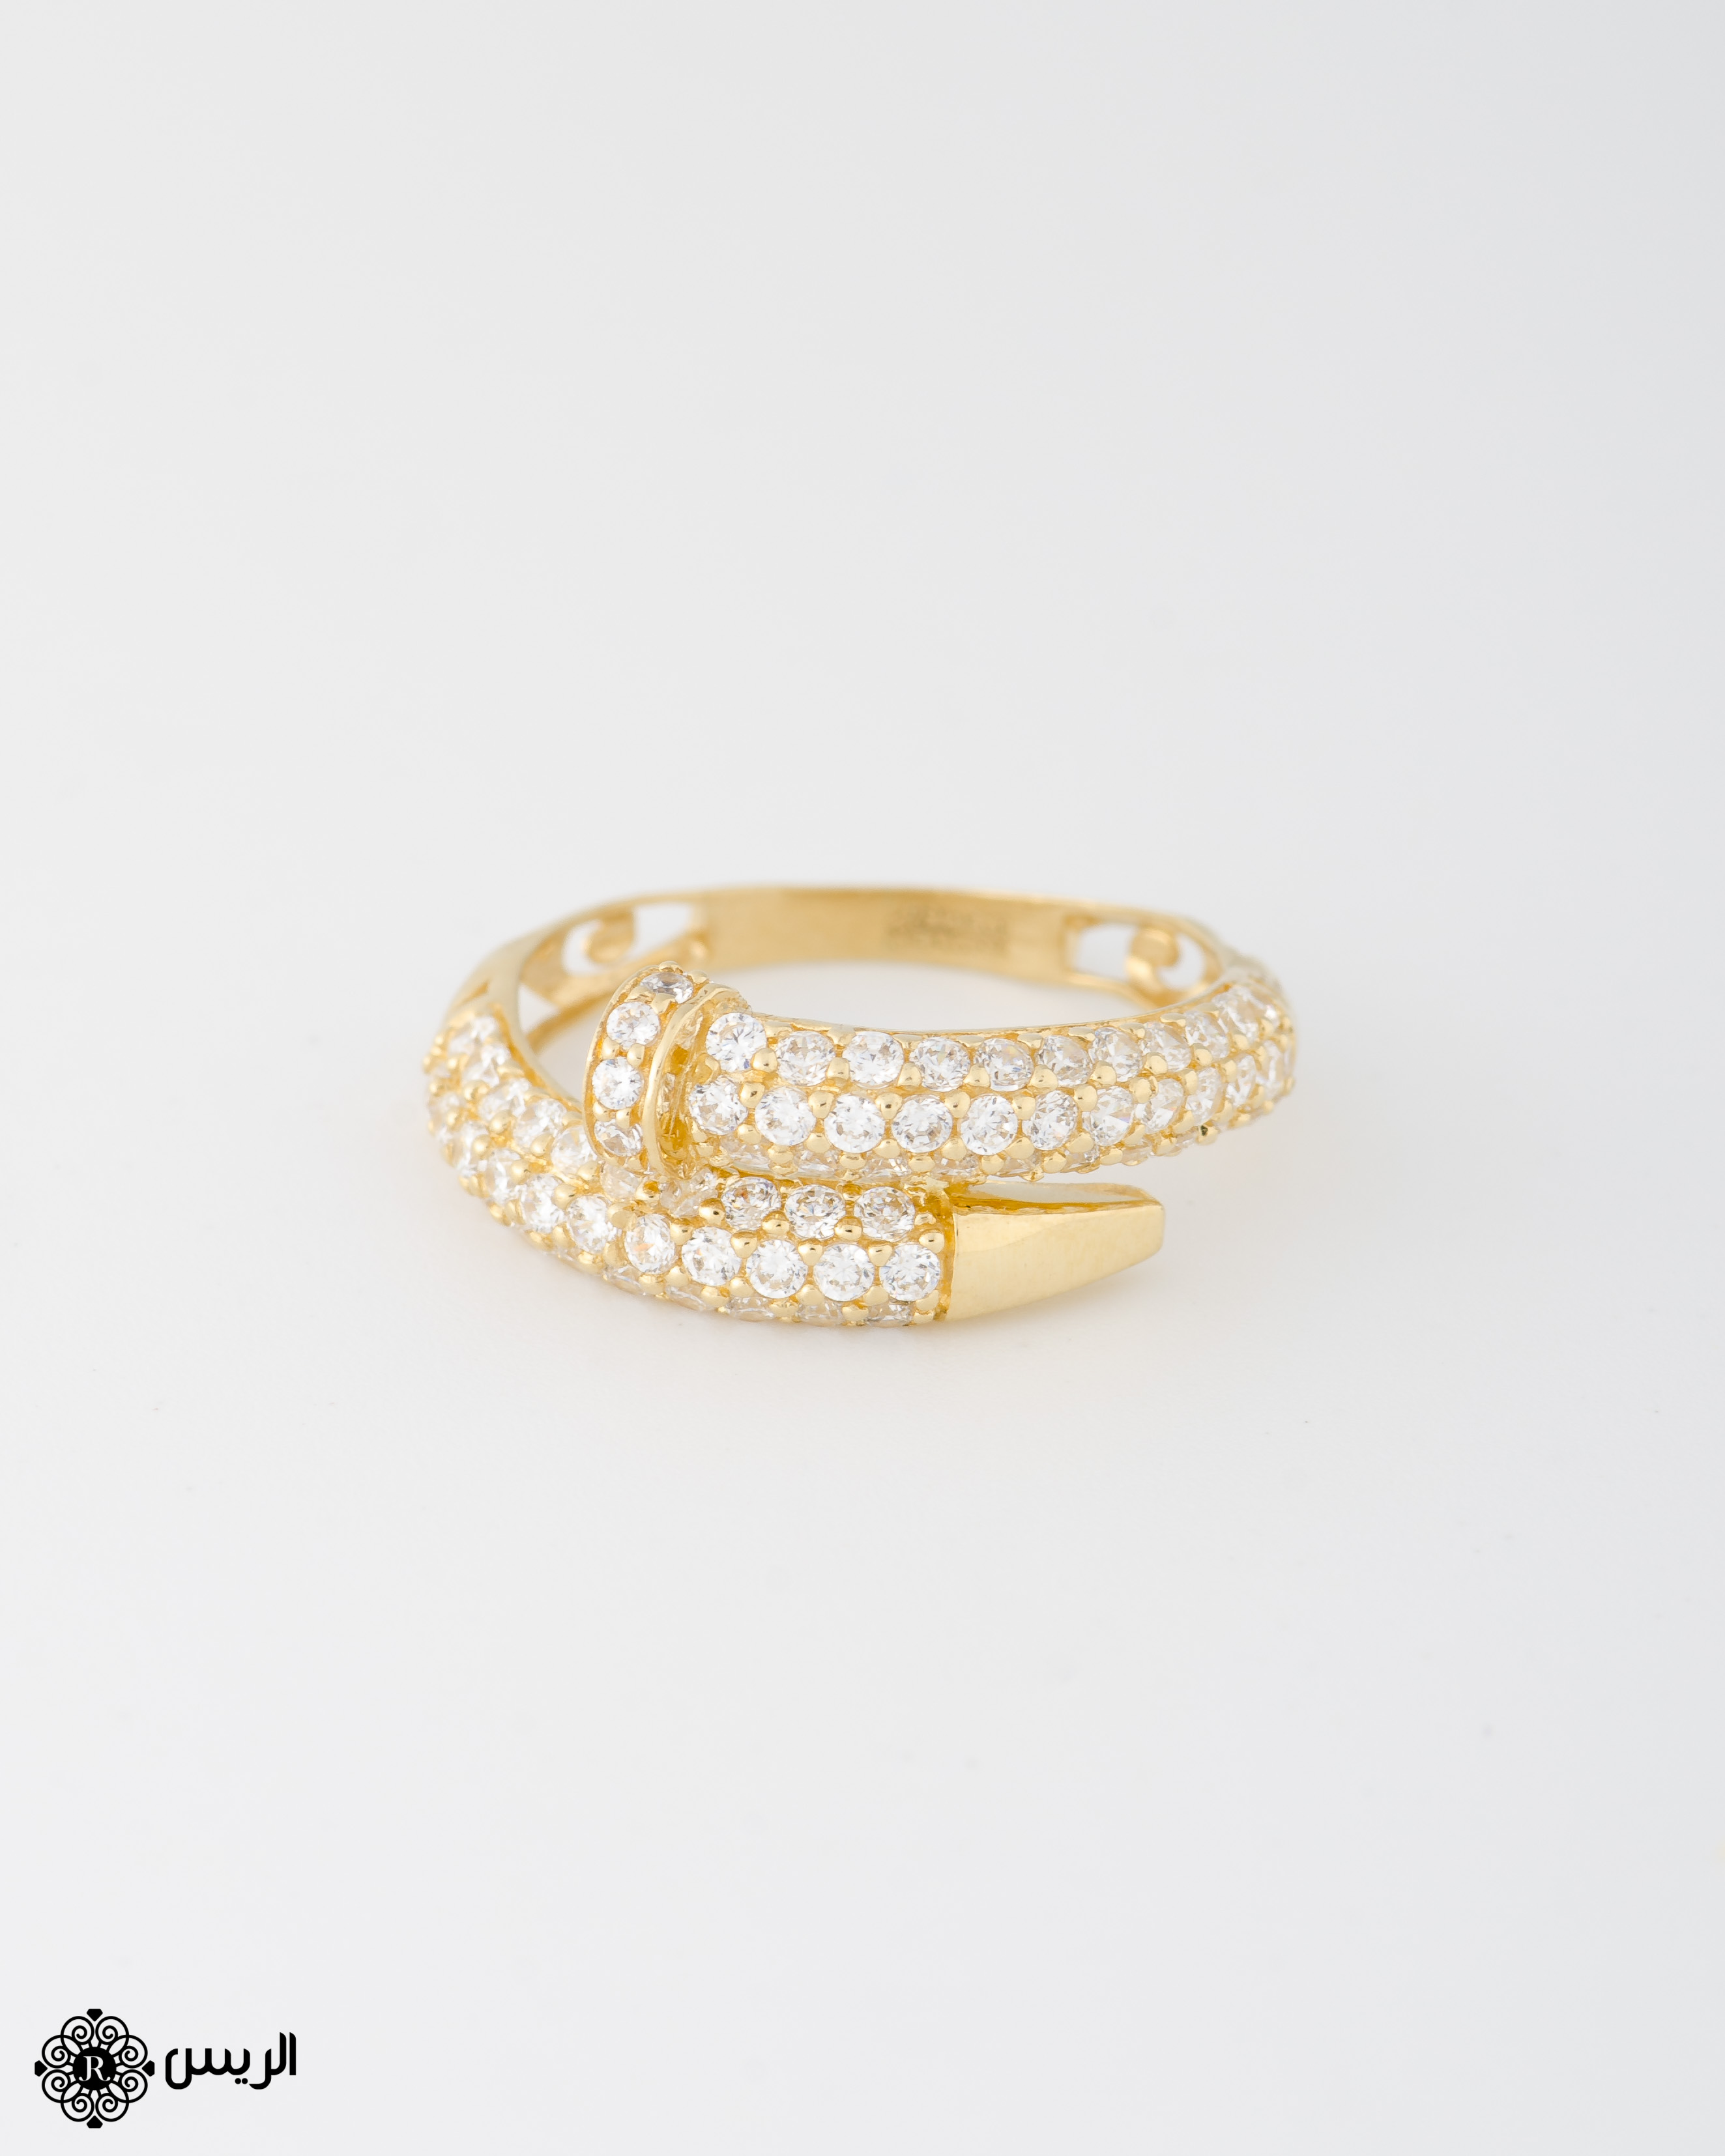 Raies jewelry Delicate Nail Ring خاتم مسمار الريس للمجوهرات